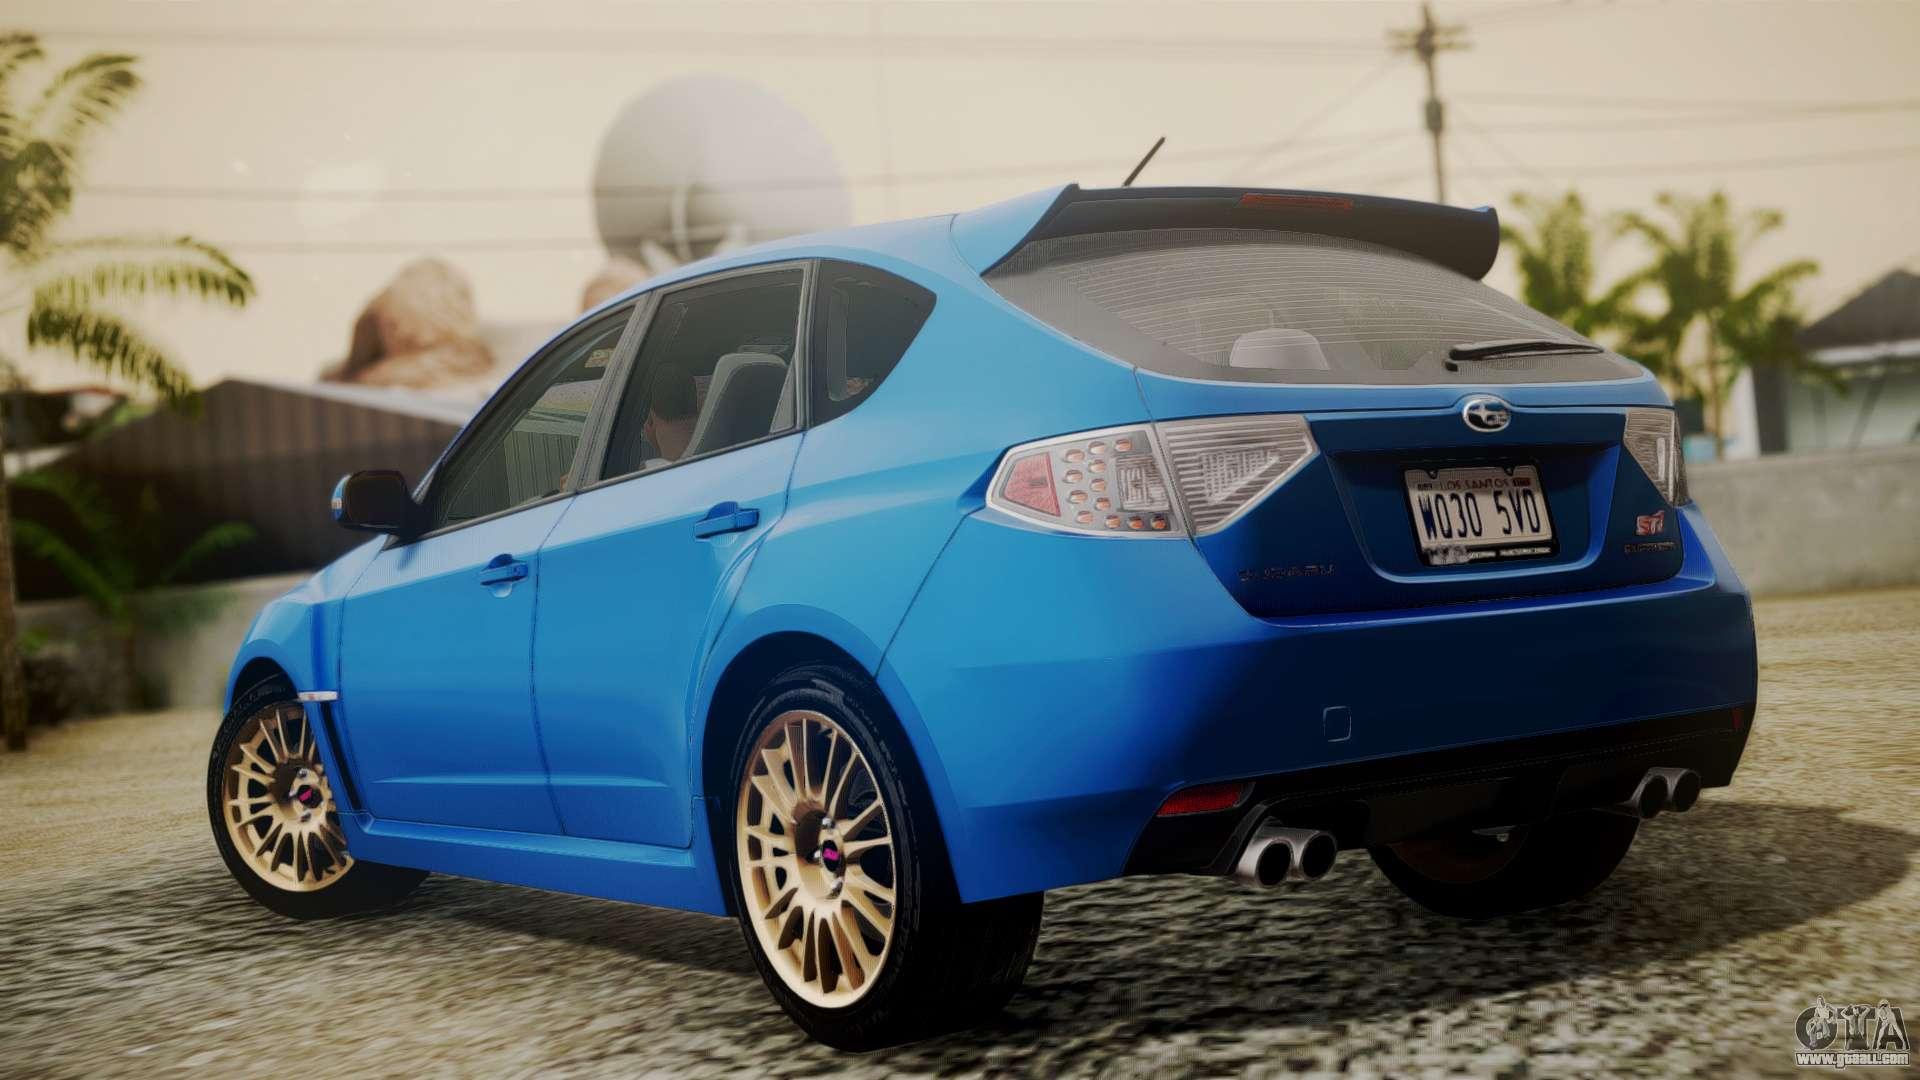 08 Wrx Hatchback >> Subaru Impreza WRX STI 2008 PJ for GTA San Andreas